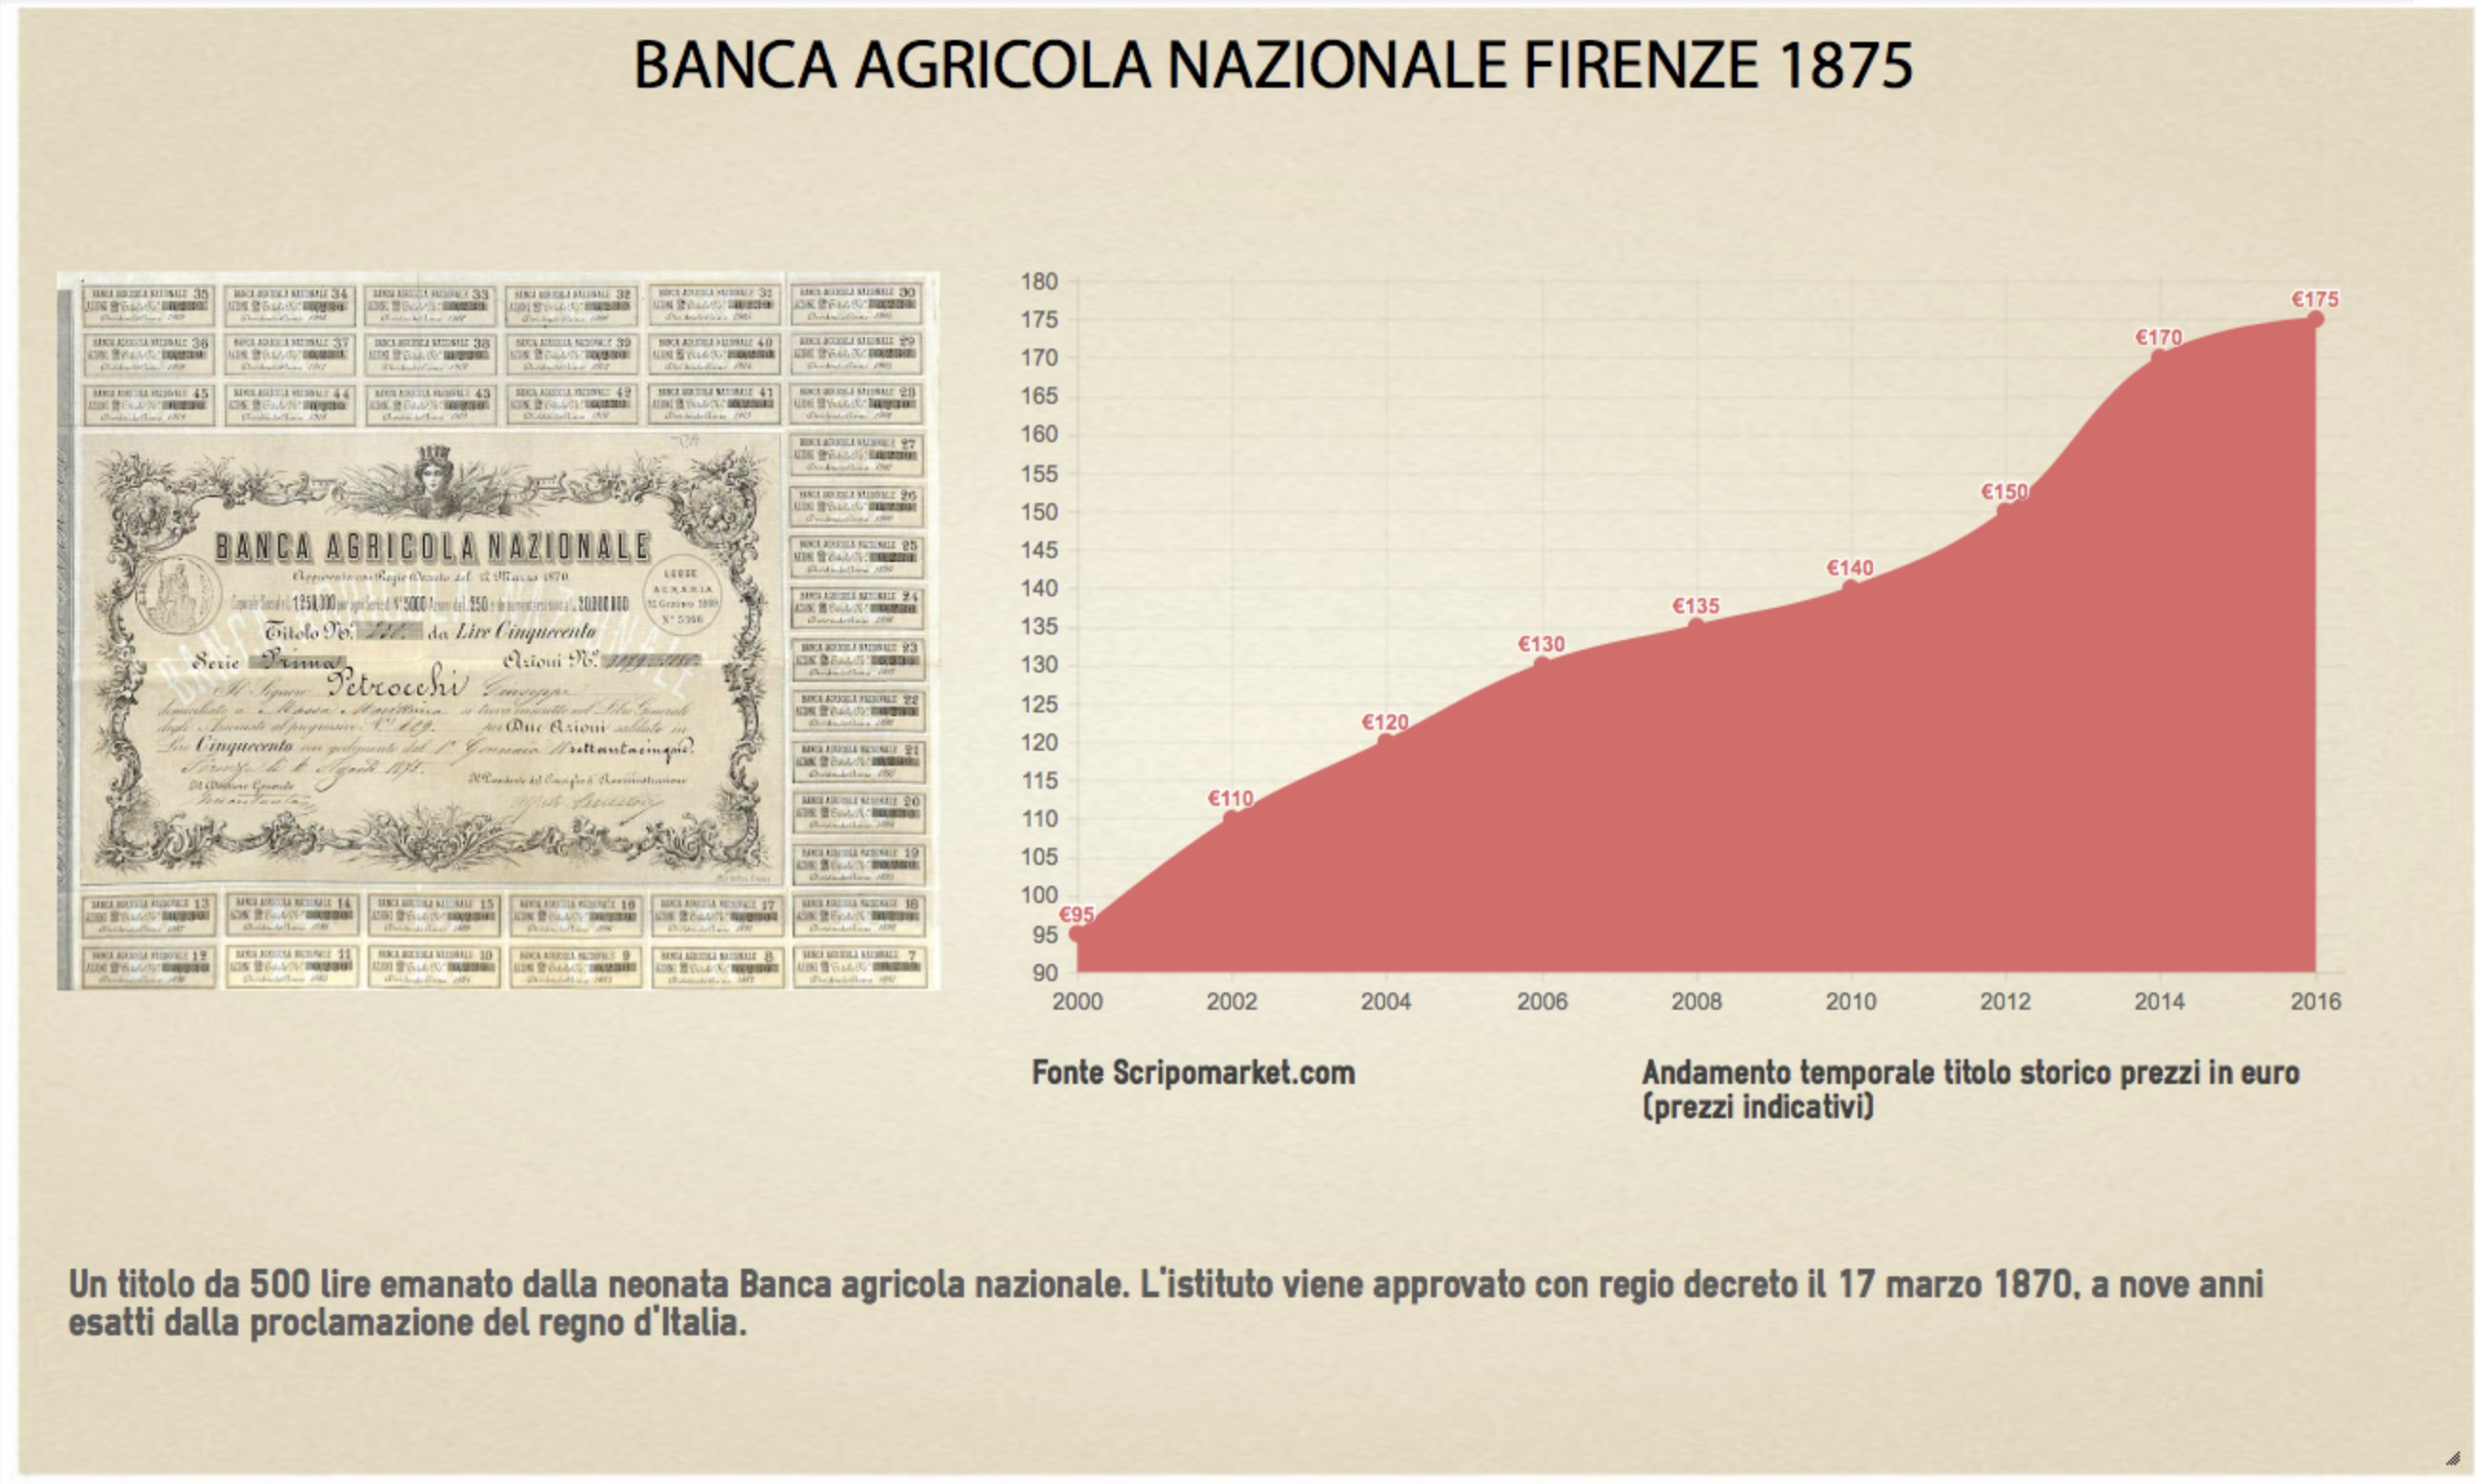 banca-agricola-nazionale-1875